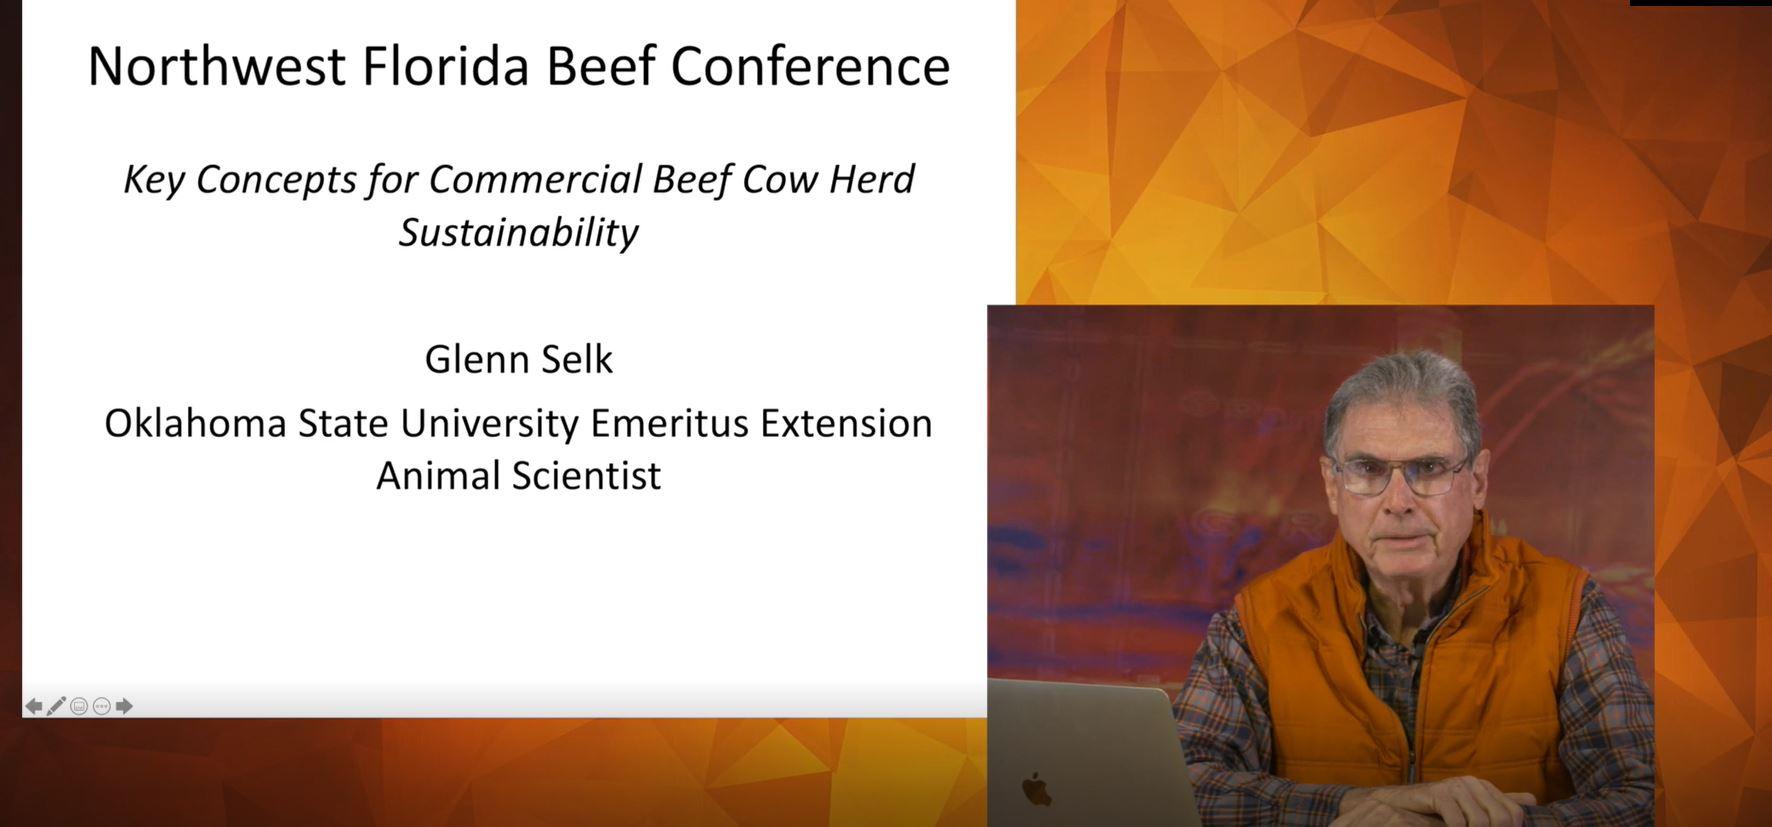 Glenn Selk, keynote speaker at the Virtual Beef Conference